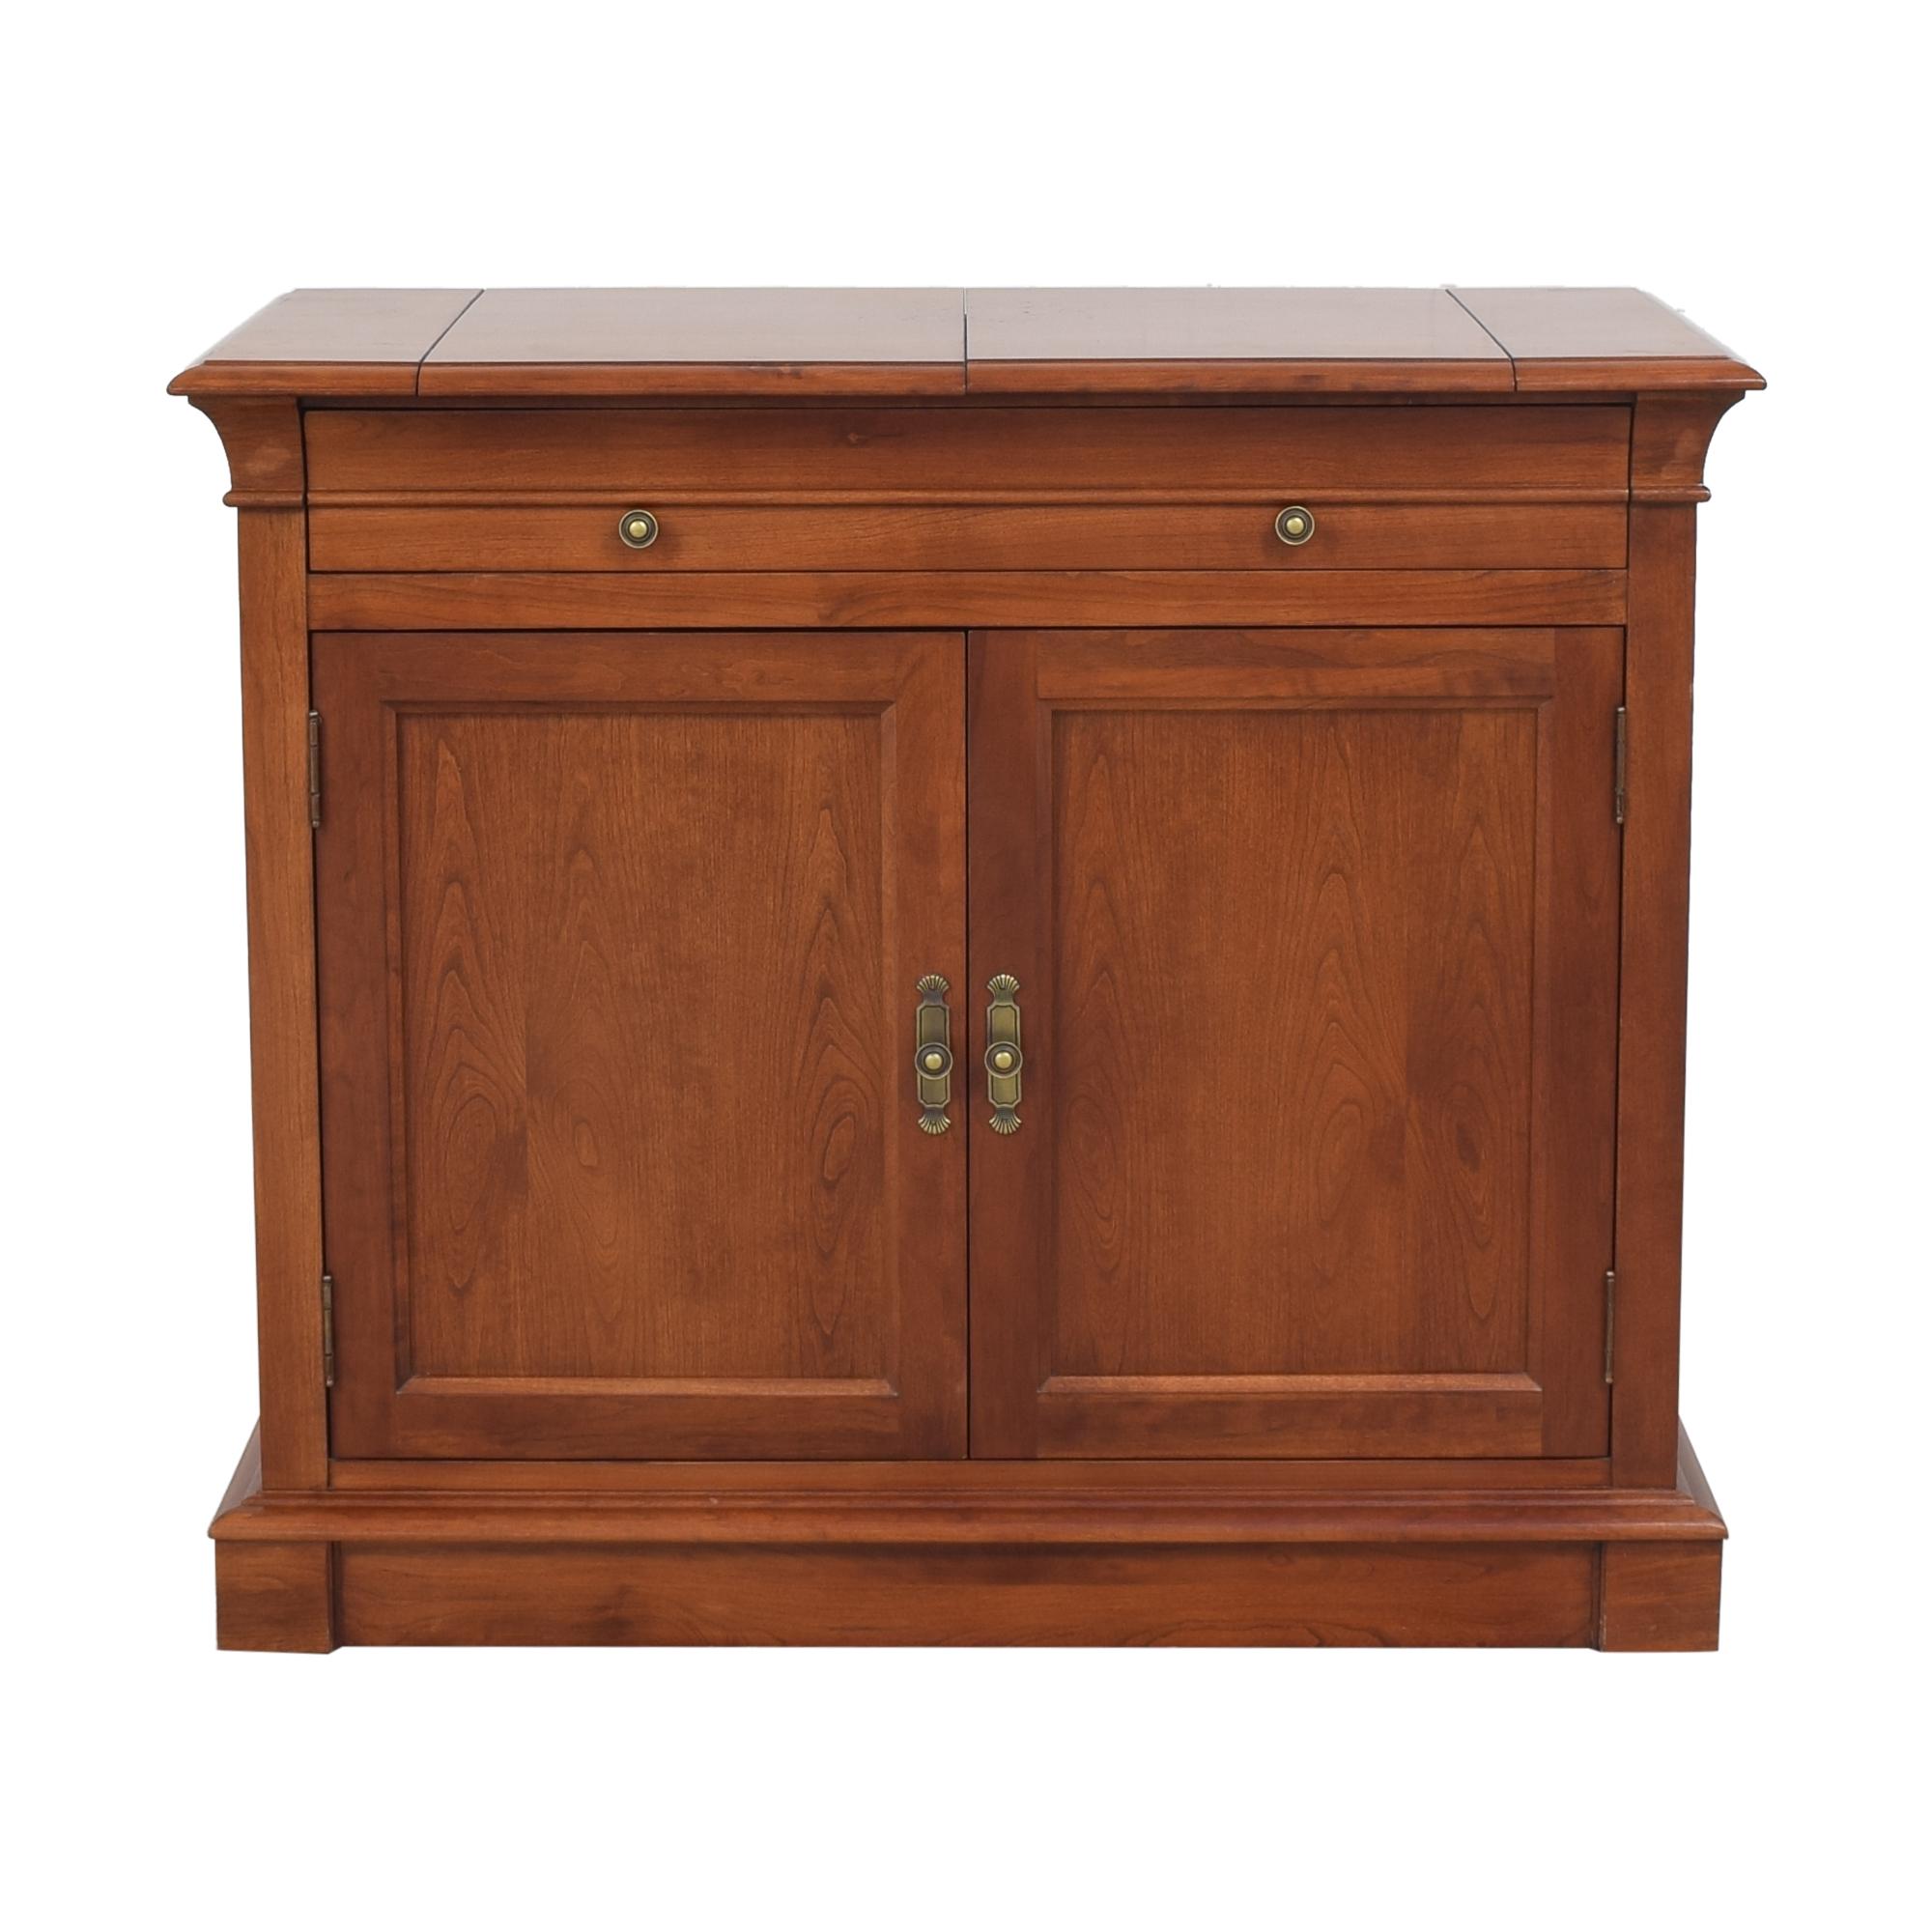 Ethan Allen Medallion Collection Flip Top Server / Cabinets & Sideboards